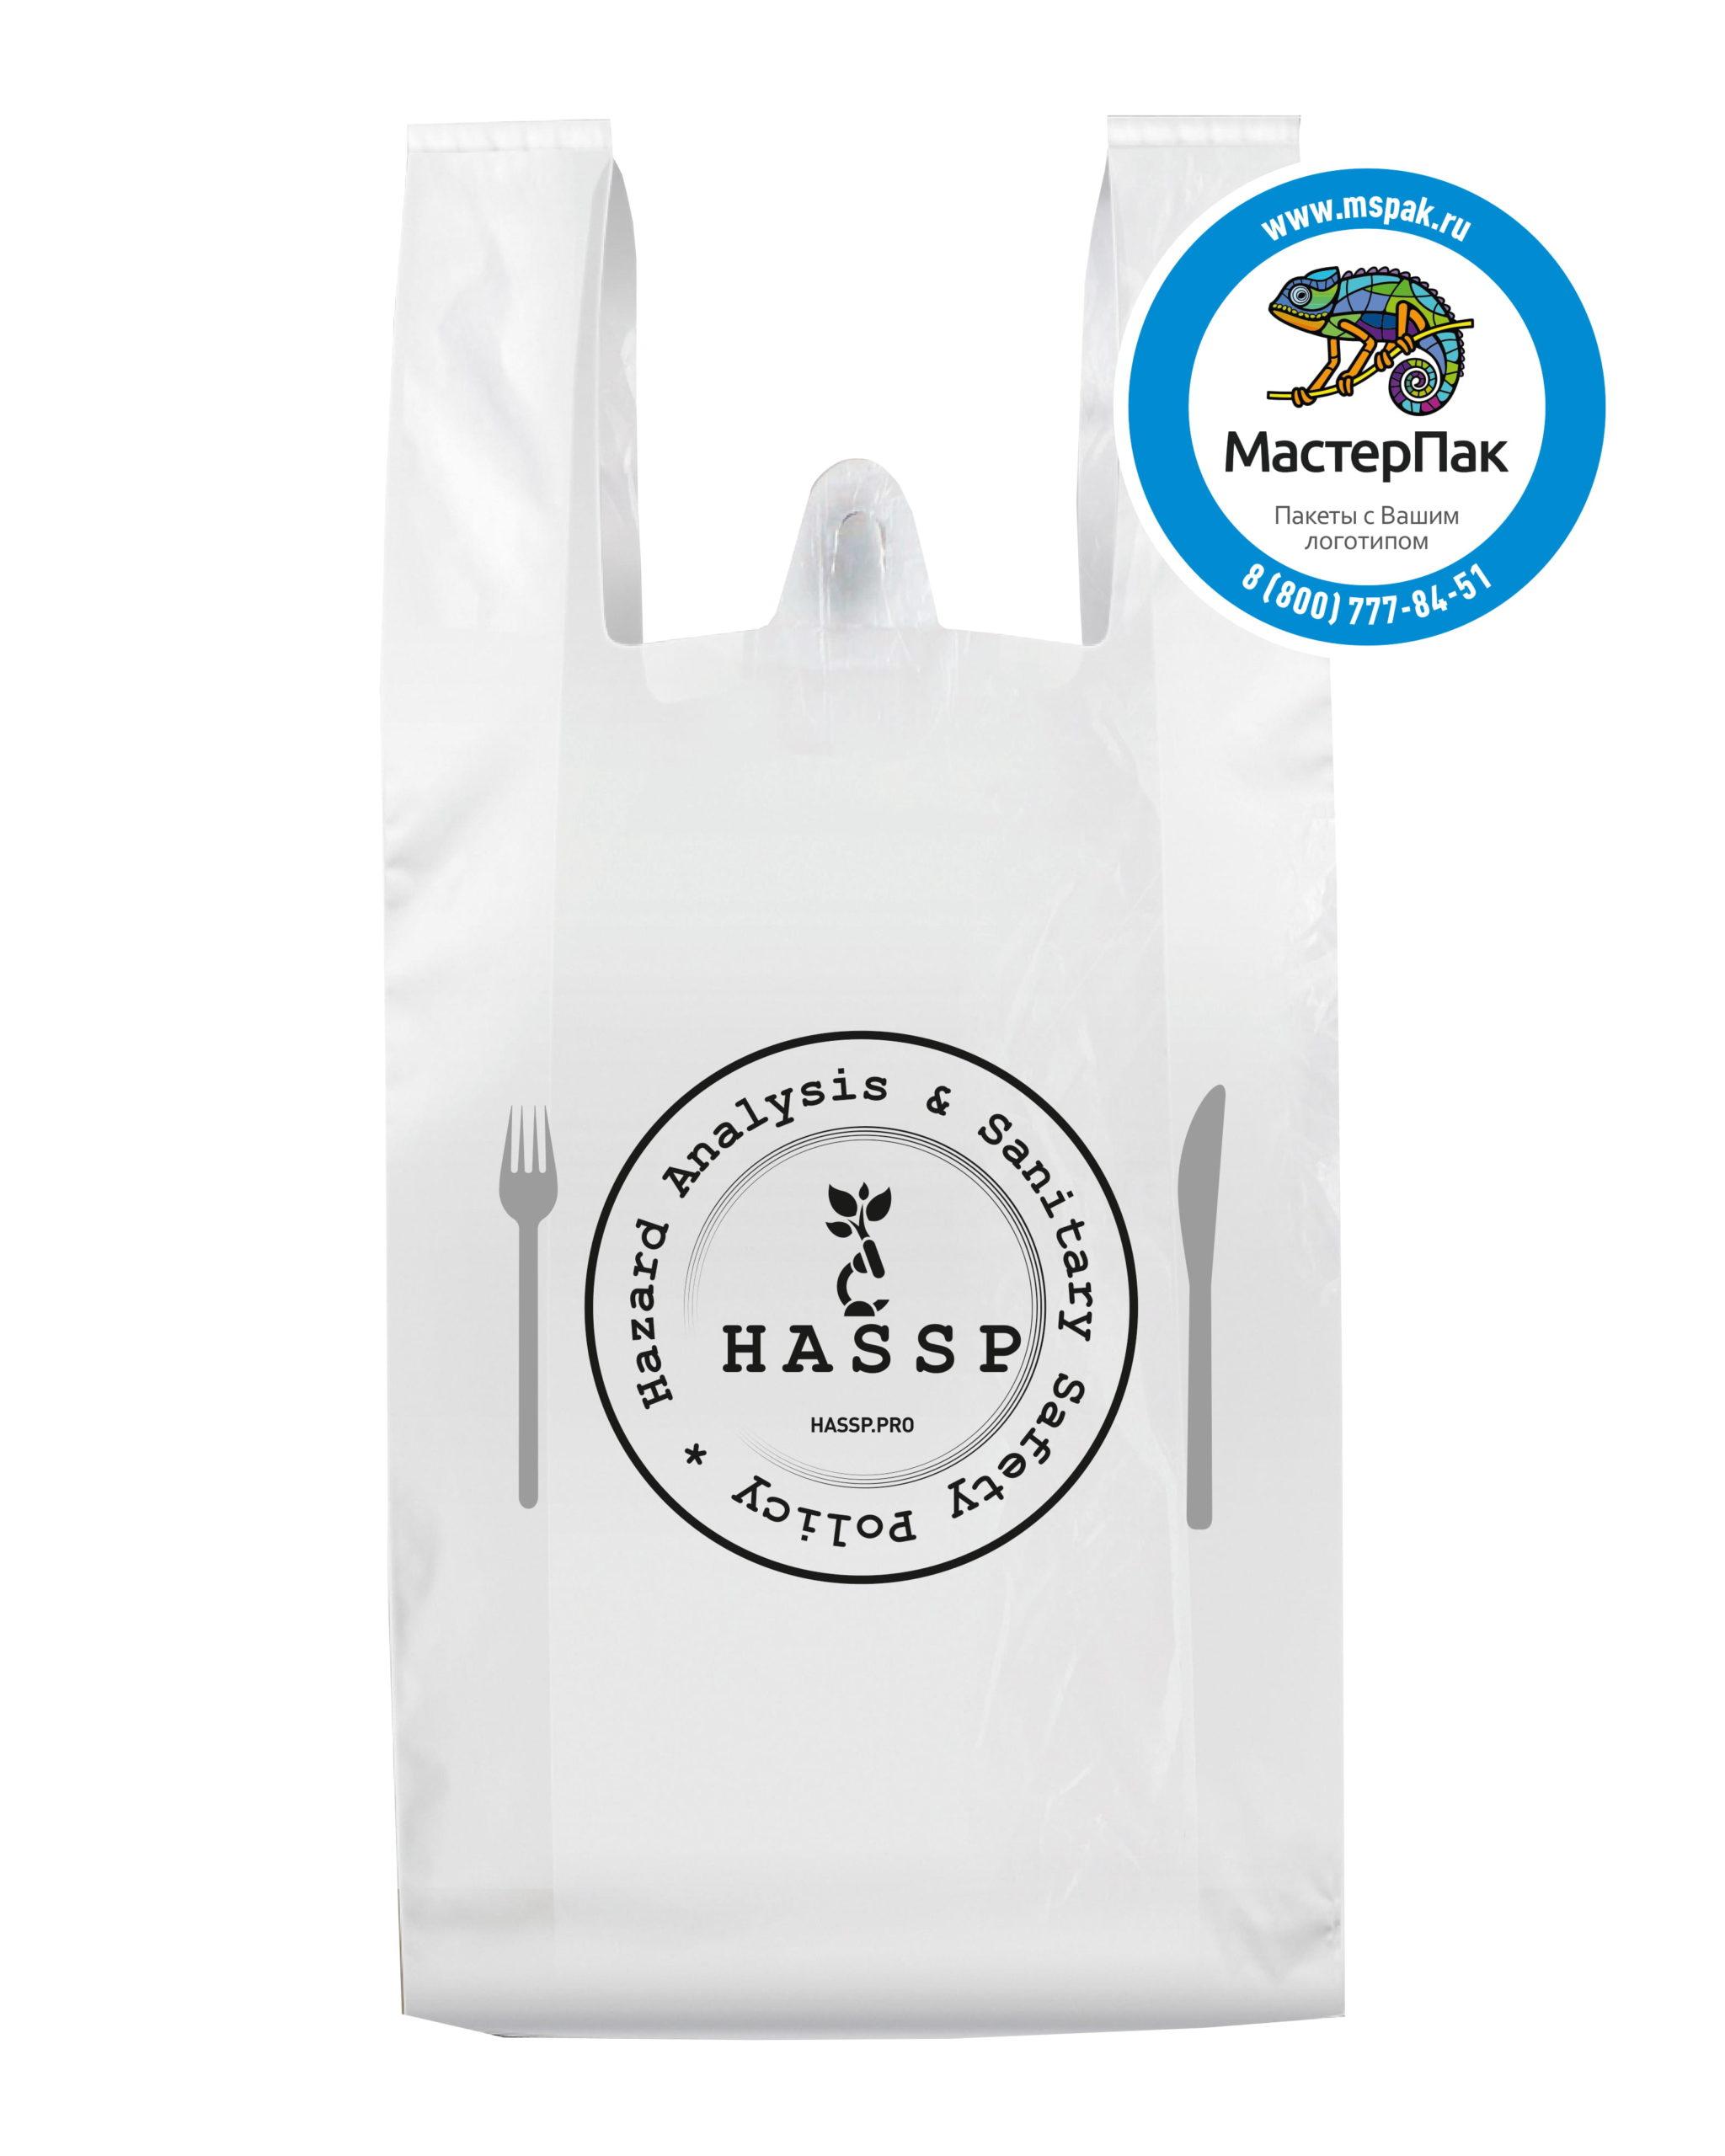 Пакет-майка ПНД с логотипом HASSP, 40*60 см, 30 мкм